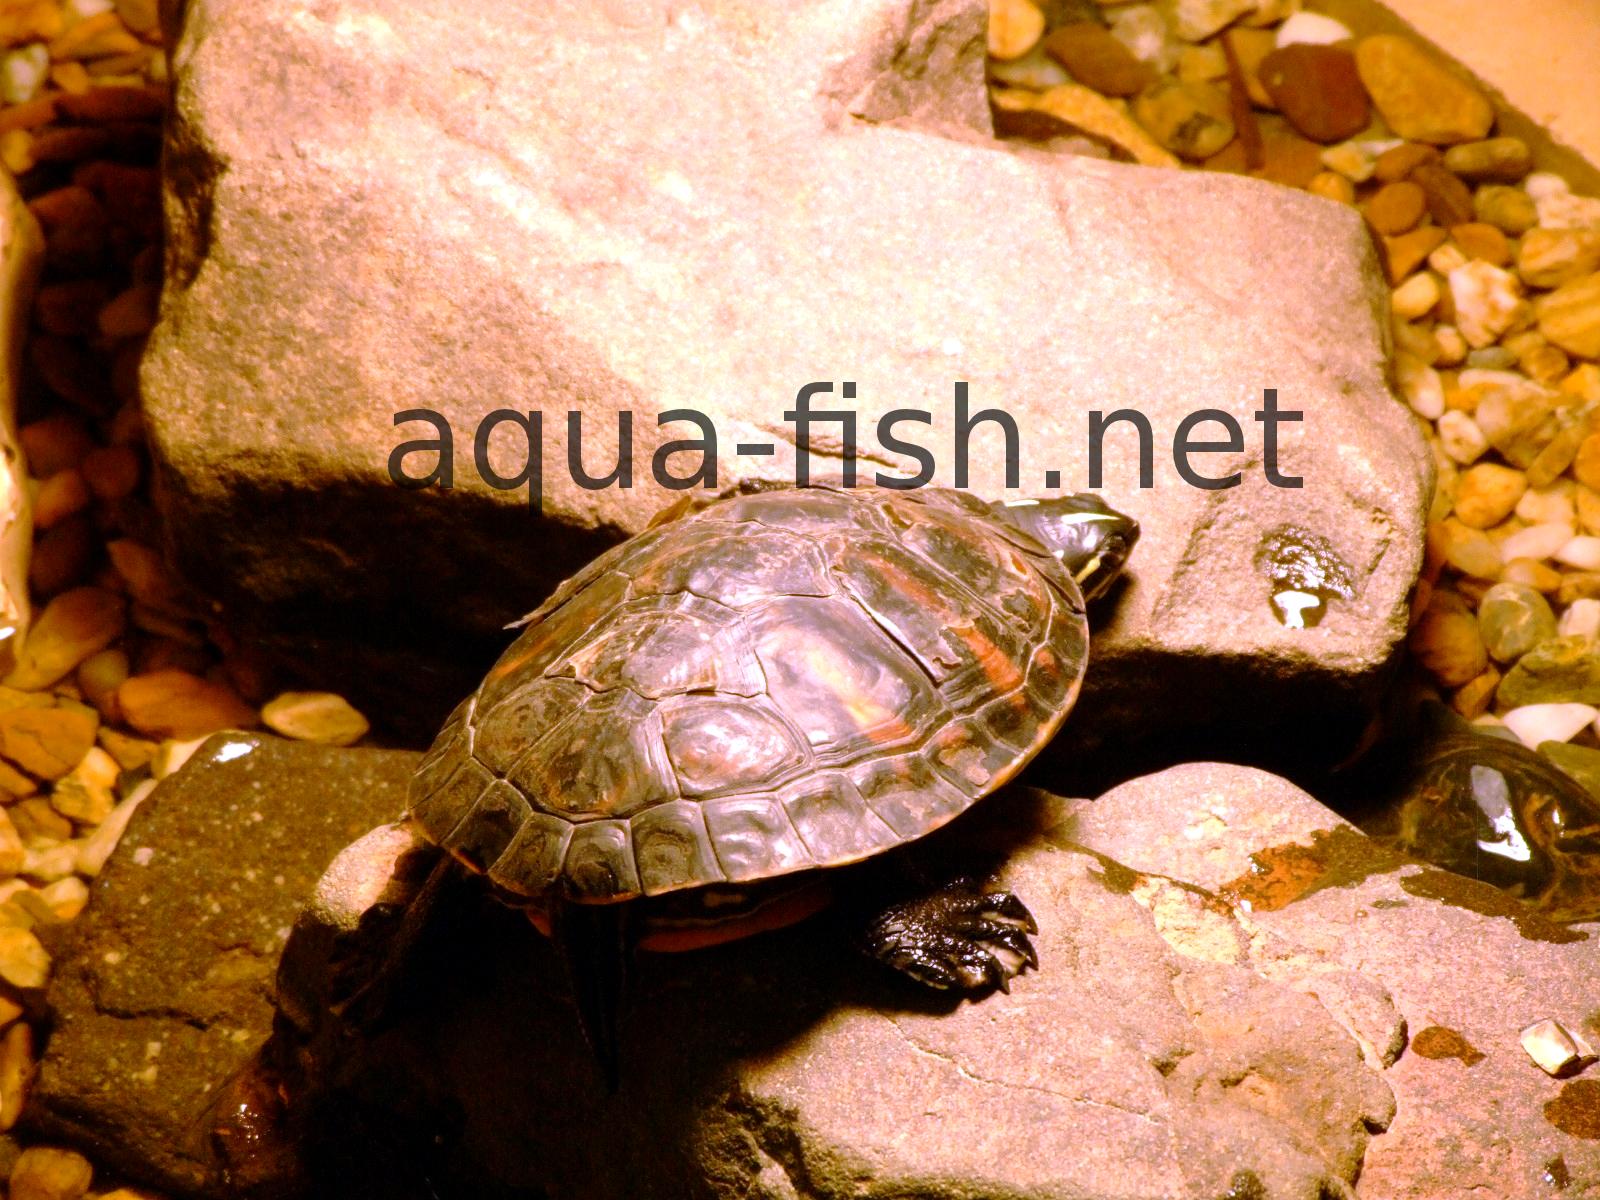 Fish Tank Turtles : Turtle Aquariums - Setting up and Feeding Turtles